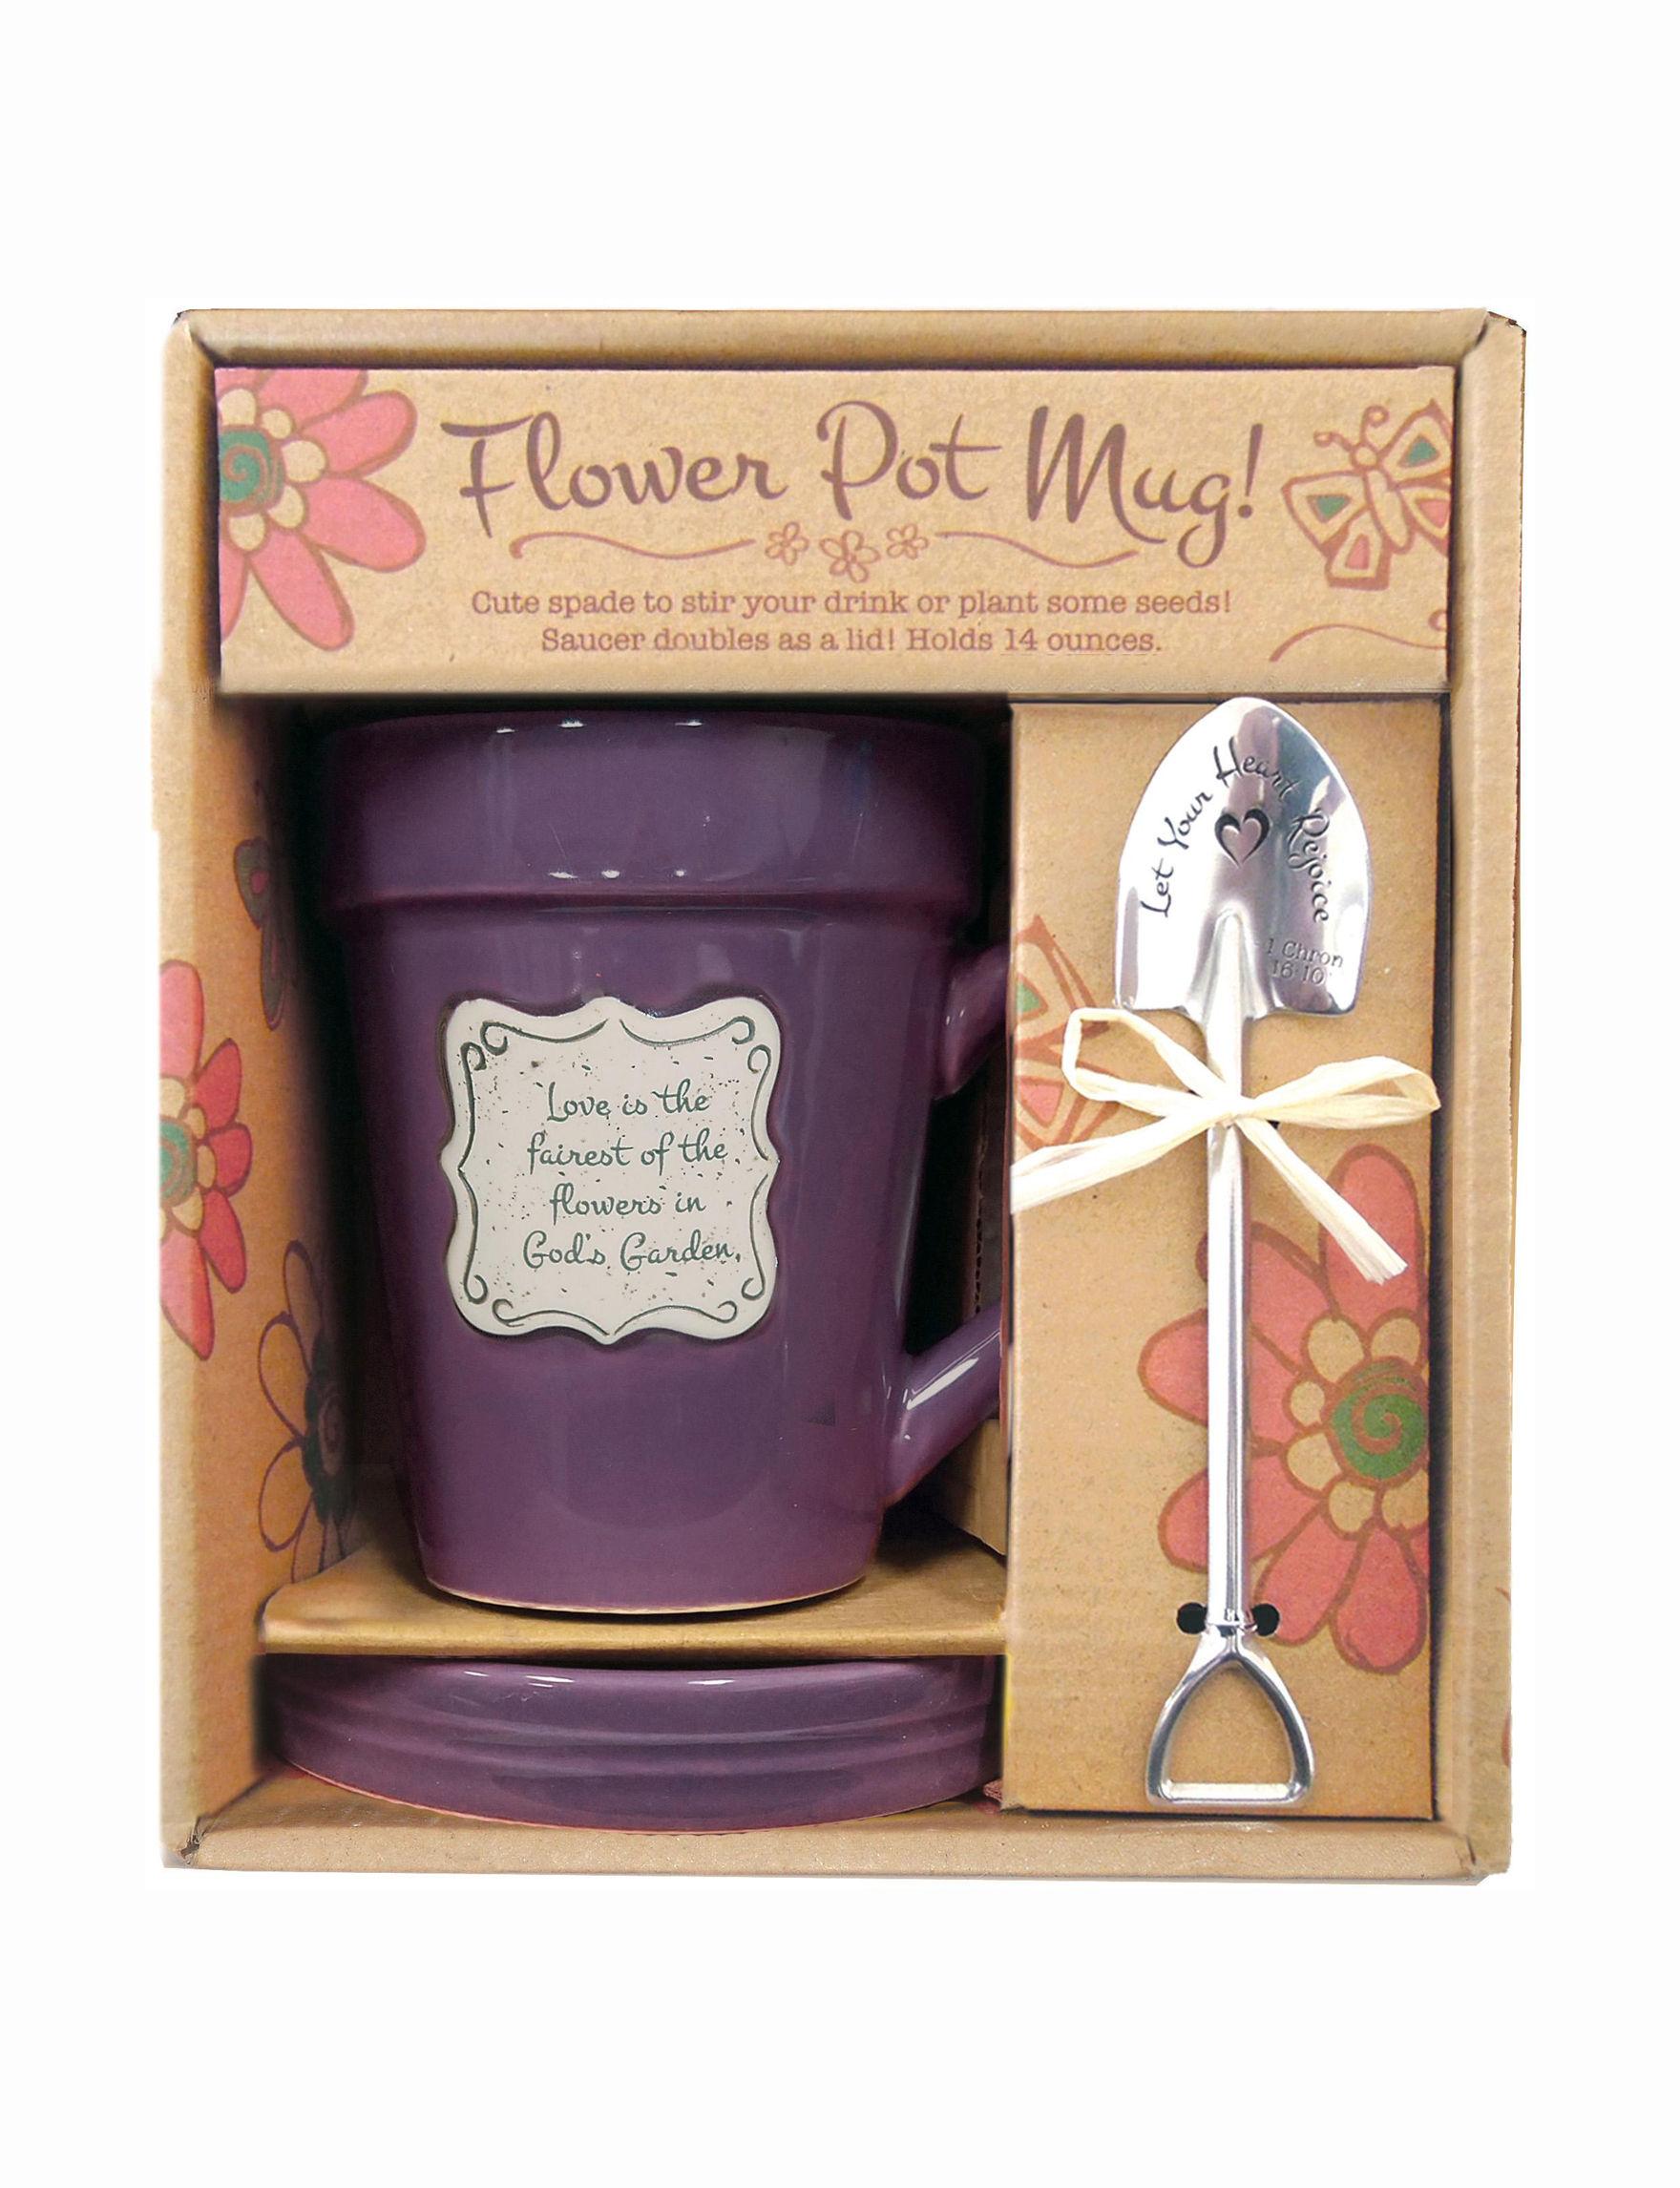 Divinity Purple Garden Decor & Planters Mugs Drinkware Outdoor Decor